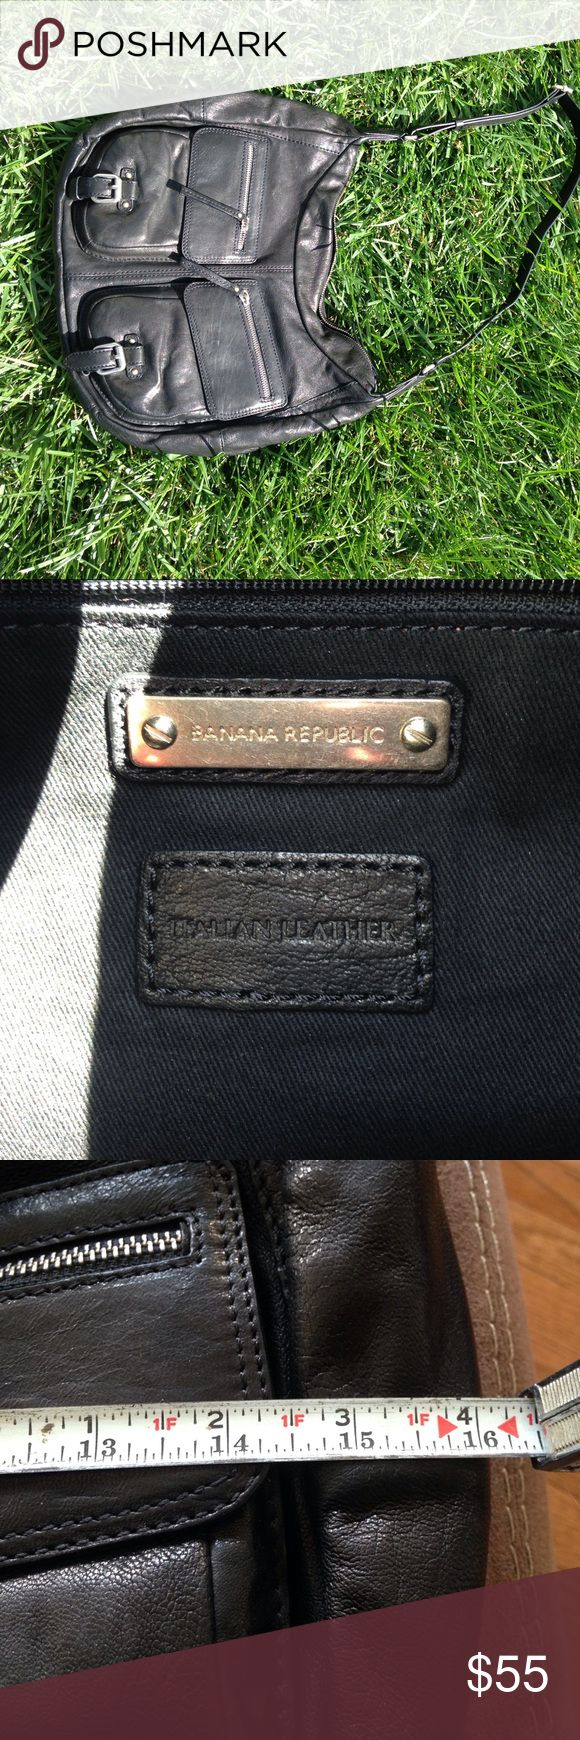 Black leather Banana Republic purse. NWOT. Black leather purse with adjustable shoulder strap. Banana Republic Bags Shoulder Bags